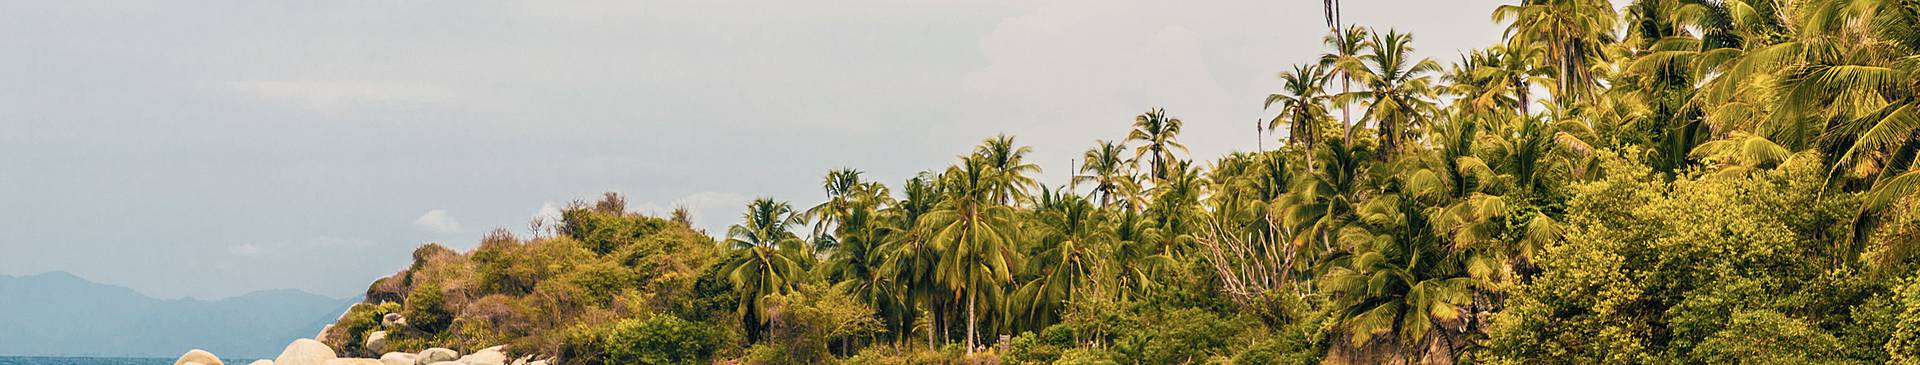 Strand und Meer Kolumbien Reisen